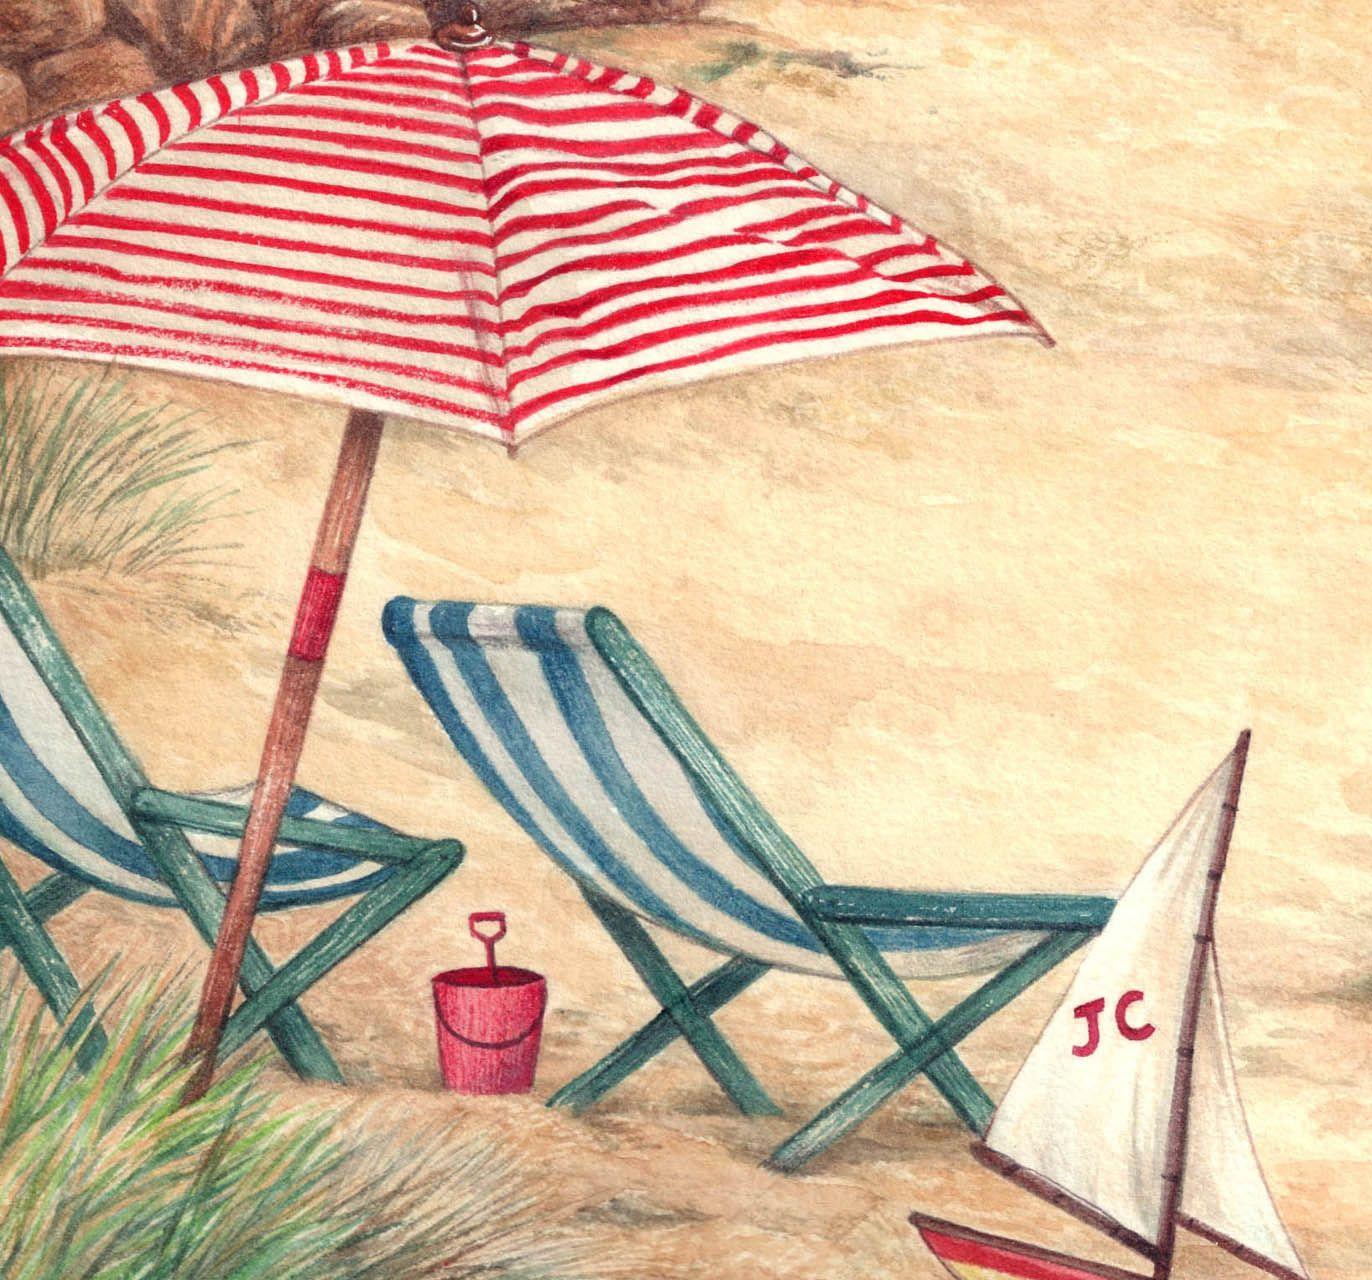 Beach chair and umbrella sketch - Asketchaday Connecticutramblings Beach Umbrella